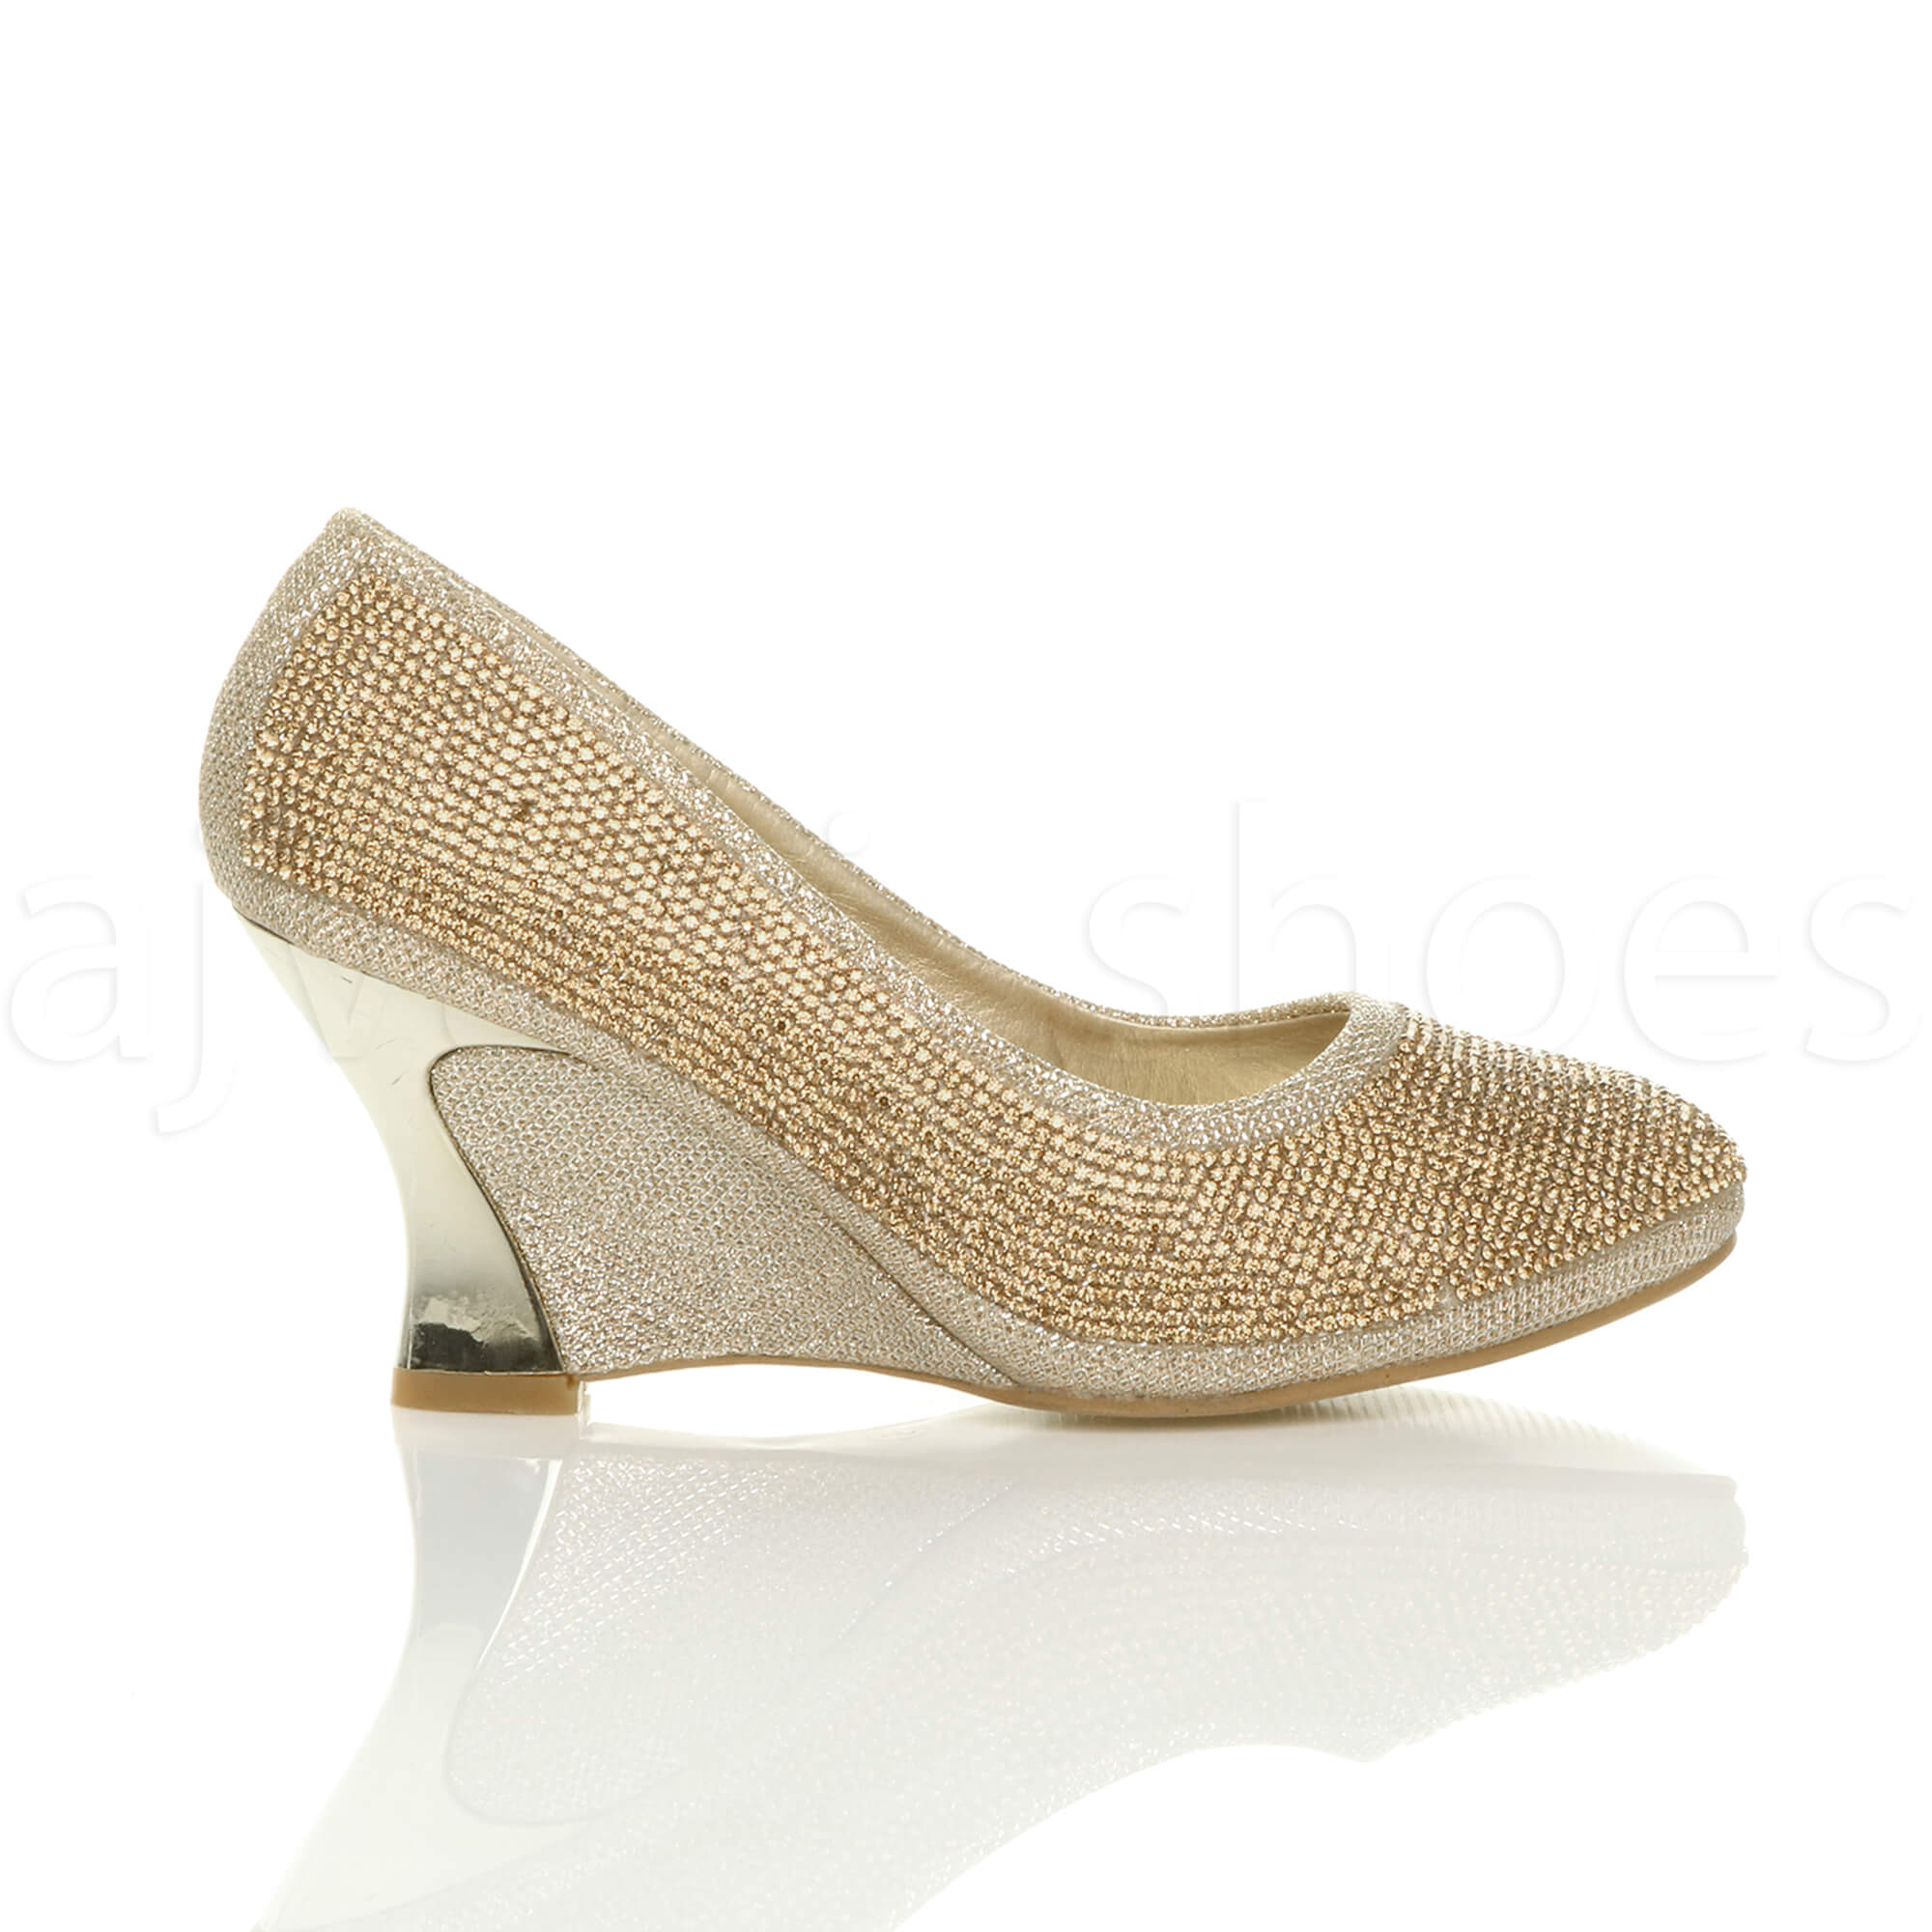 womens mid high heel wedge diamante evening